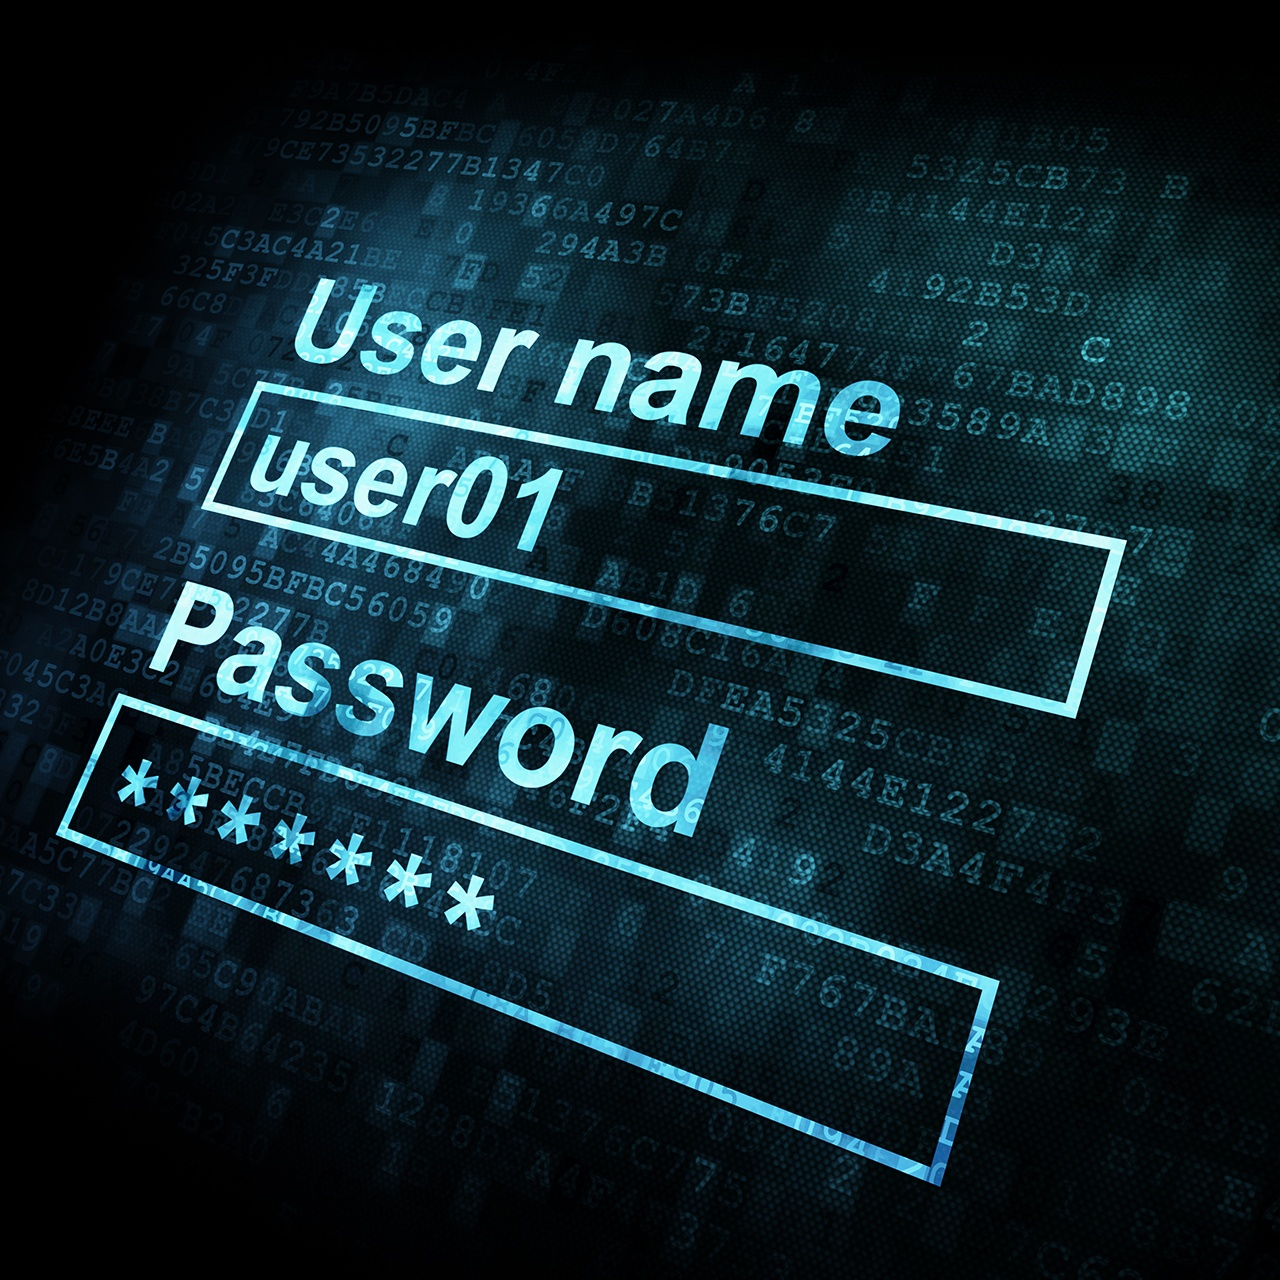 Anti Public Combo List Analysis Reveals Password Habits Improving